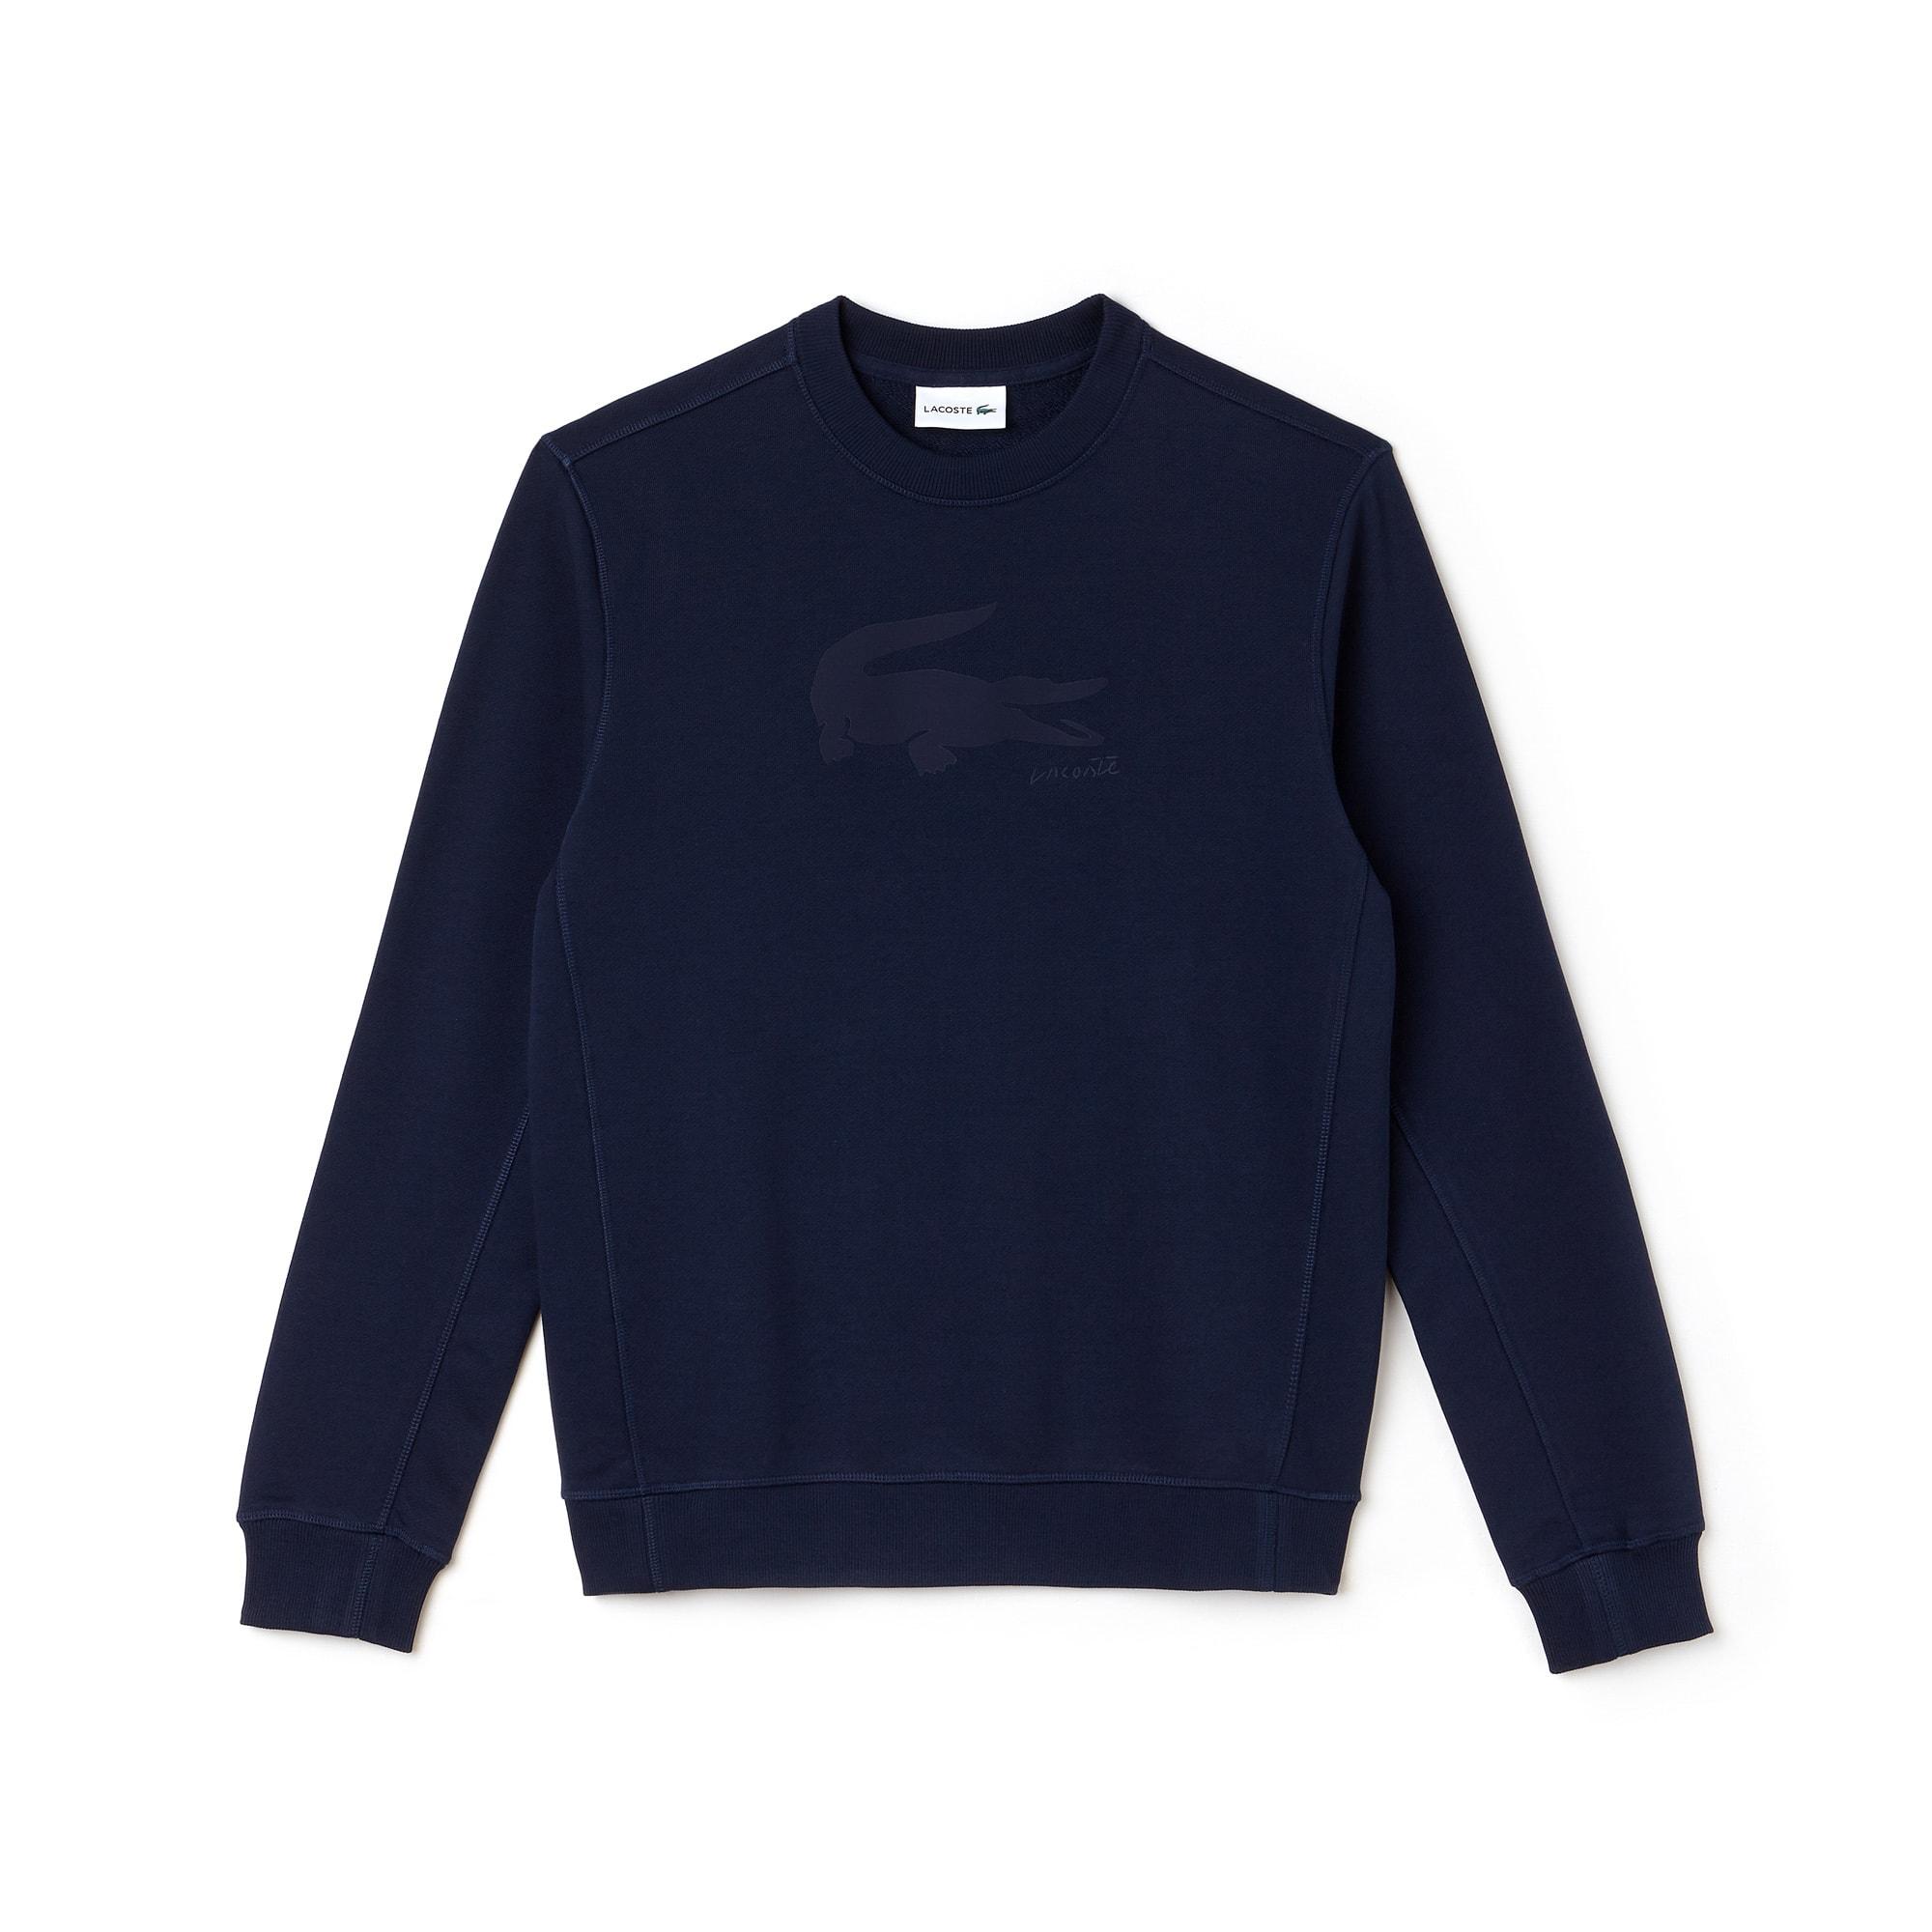 Men's Crew Neck Crocodile Print Fleece Sweatshirt